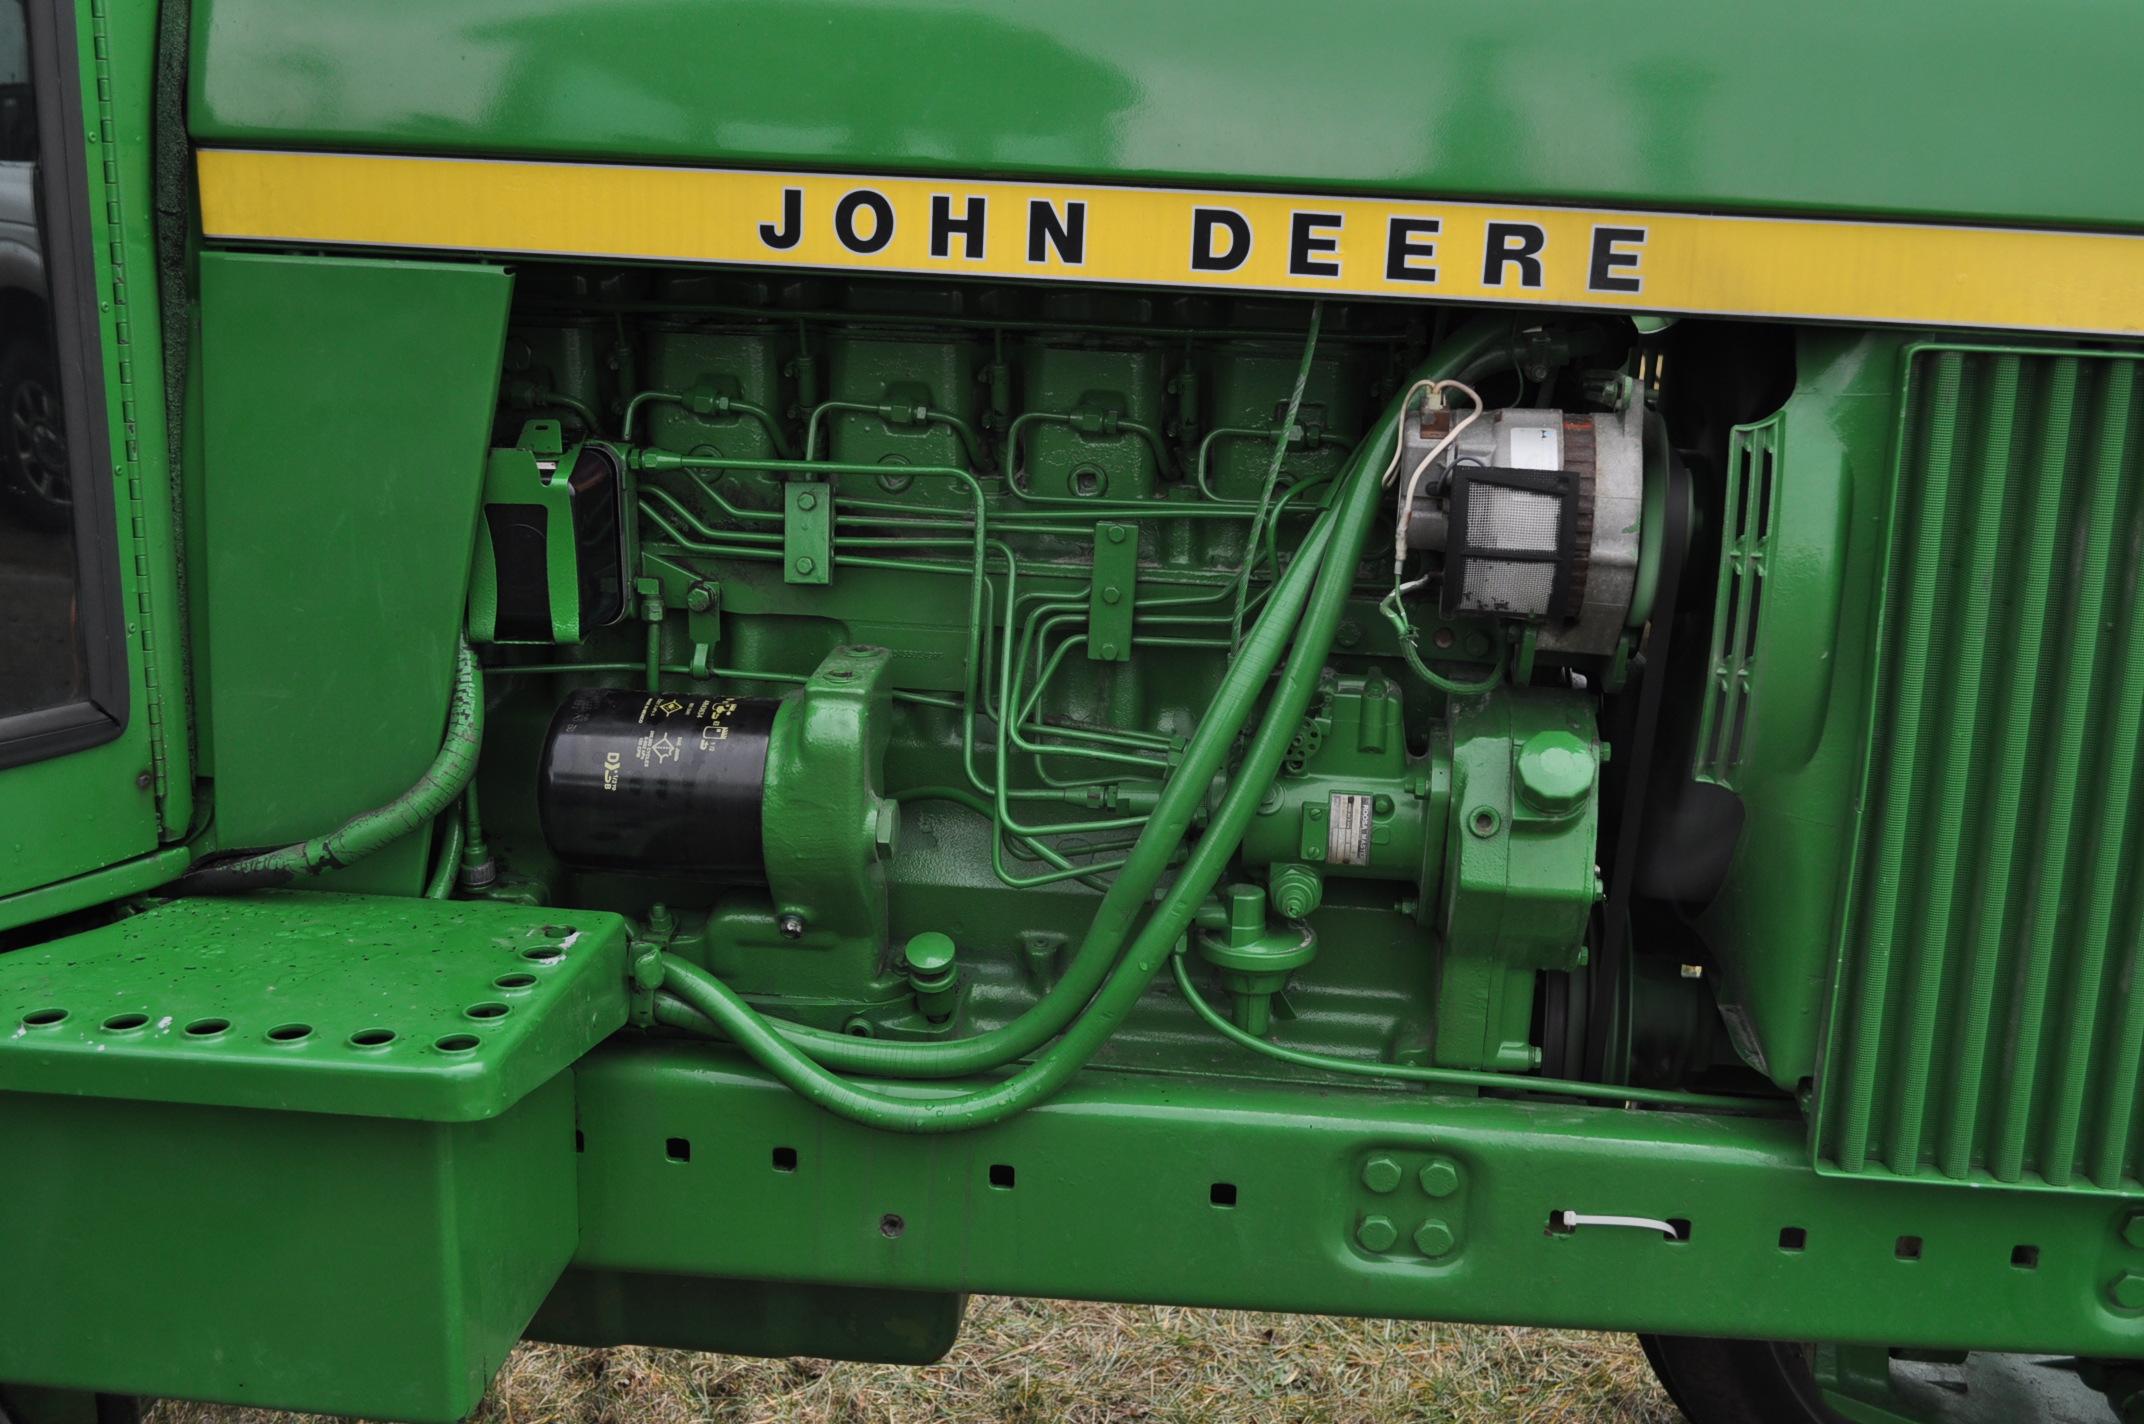 John Deere 4230 tractor, diesel, 18.4-34 hub duals, 10.00-16 front, CHA, Quad range, 2 hyd - Image 9 of 23